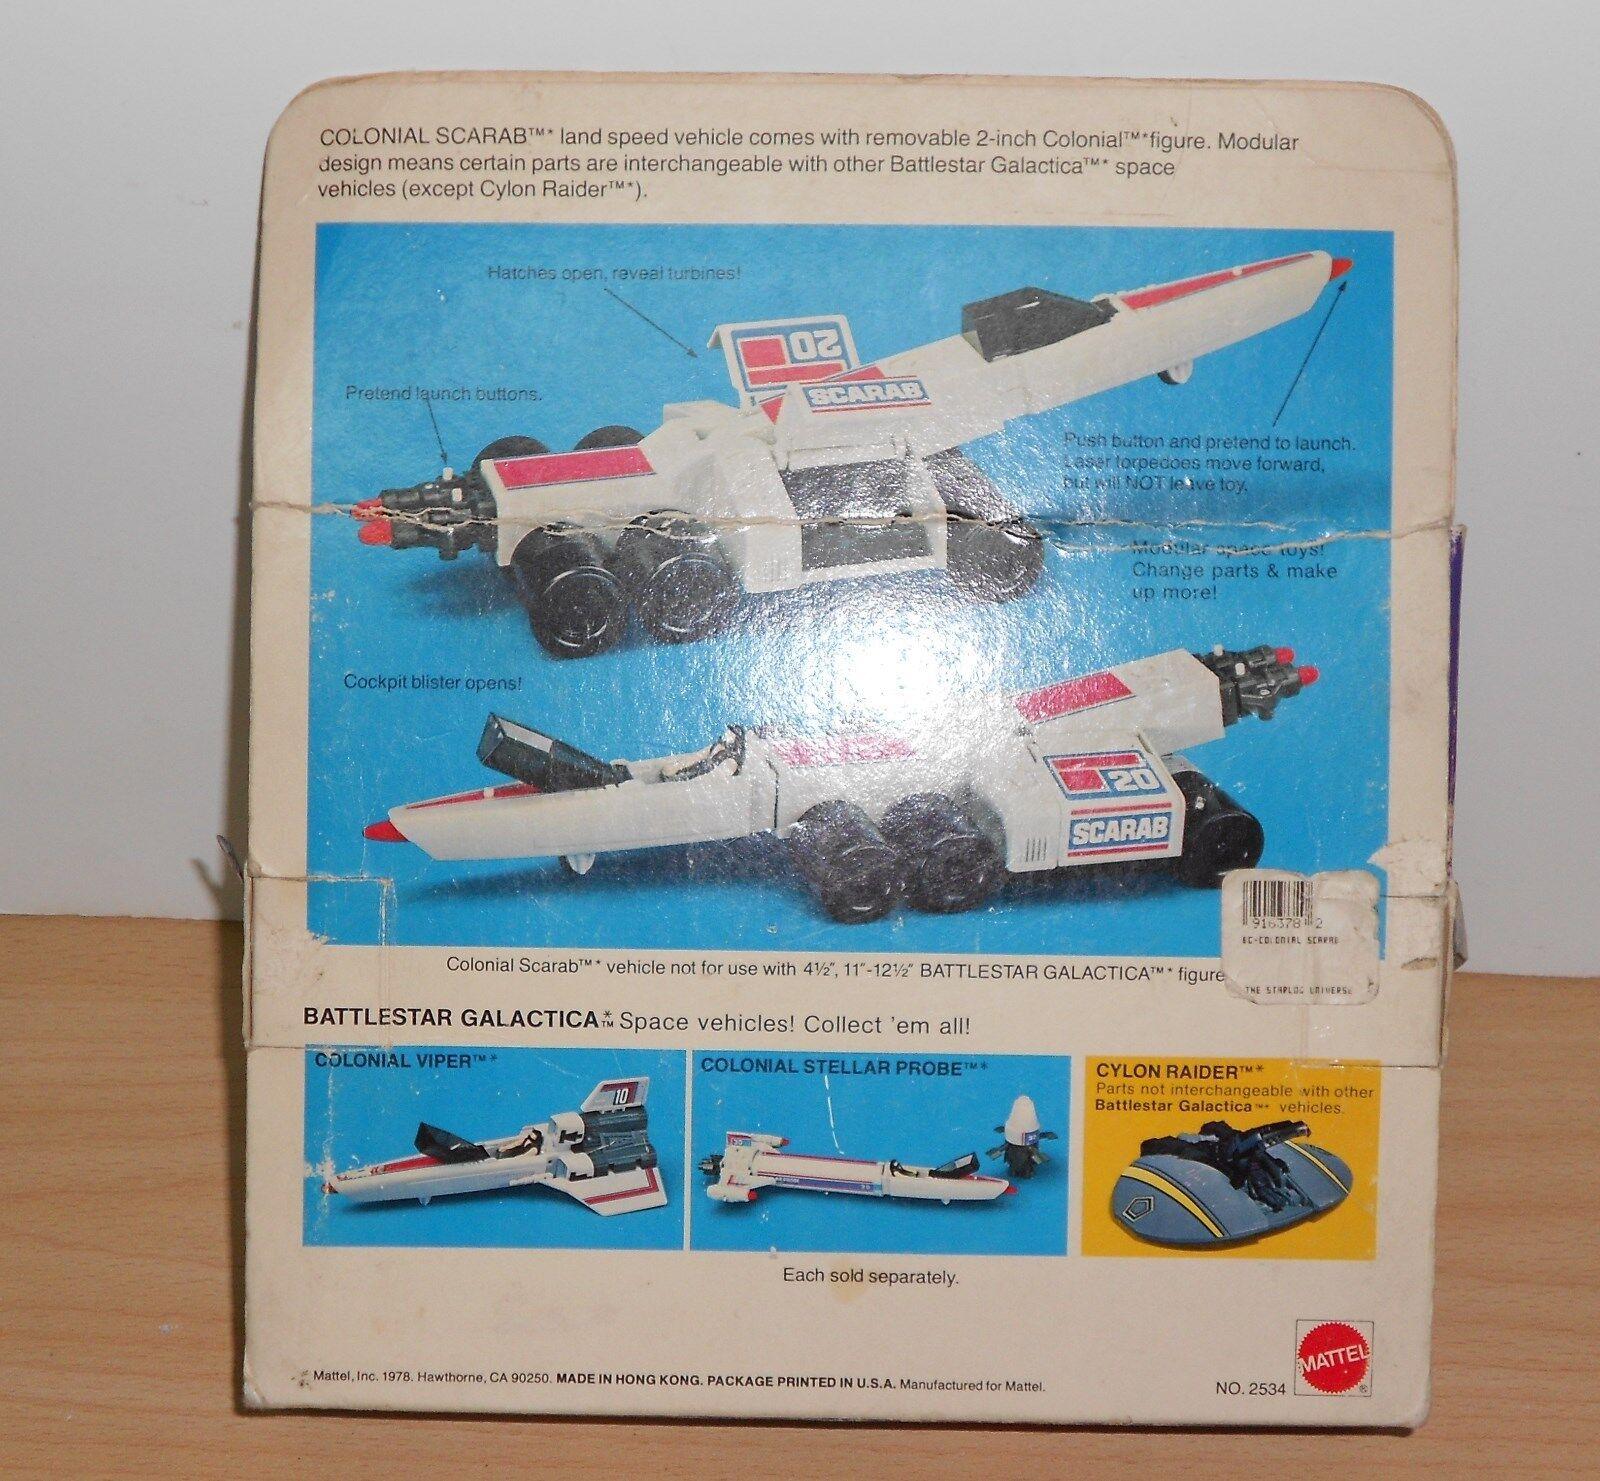 Mattel BATTLESTAR GALACTICA GALACTICA GALACTICA COLONIAL SCARAB Space Vehicle - VINTAGE 1978 d4e685